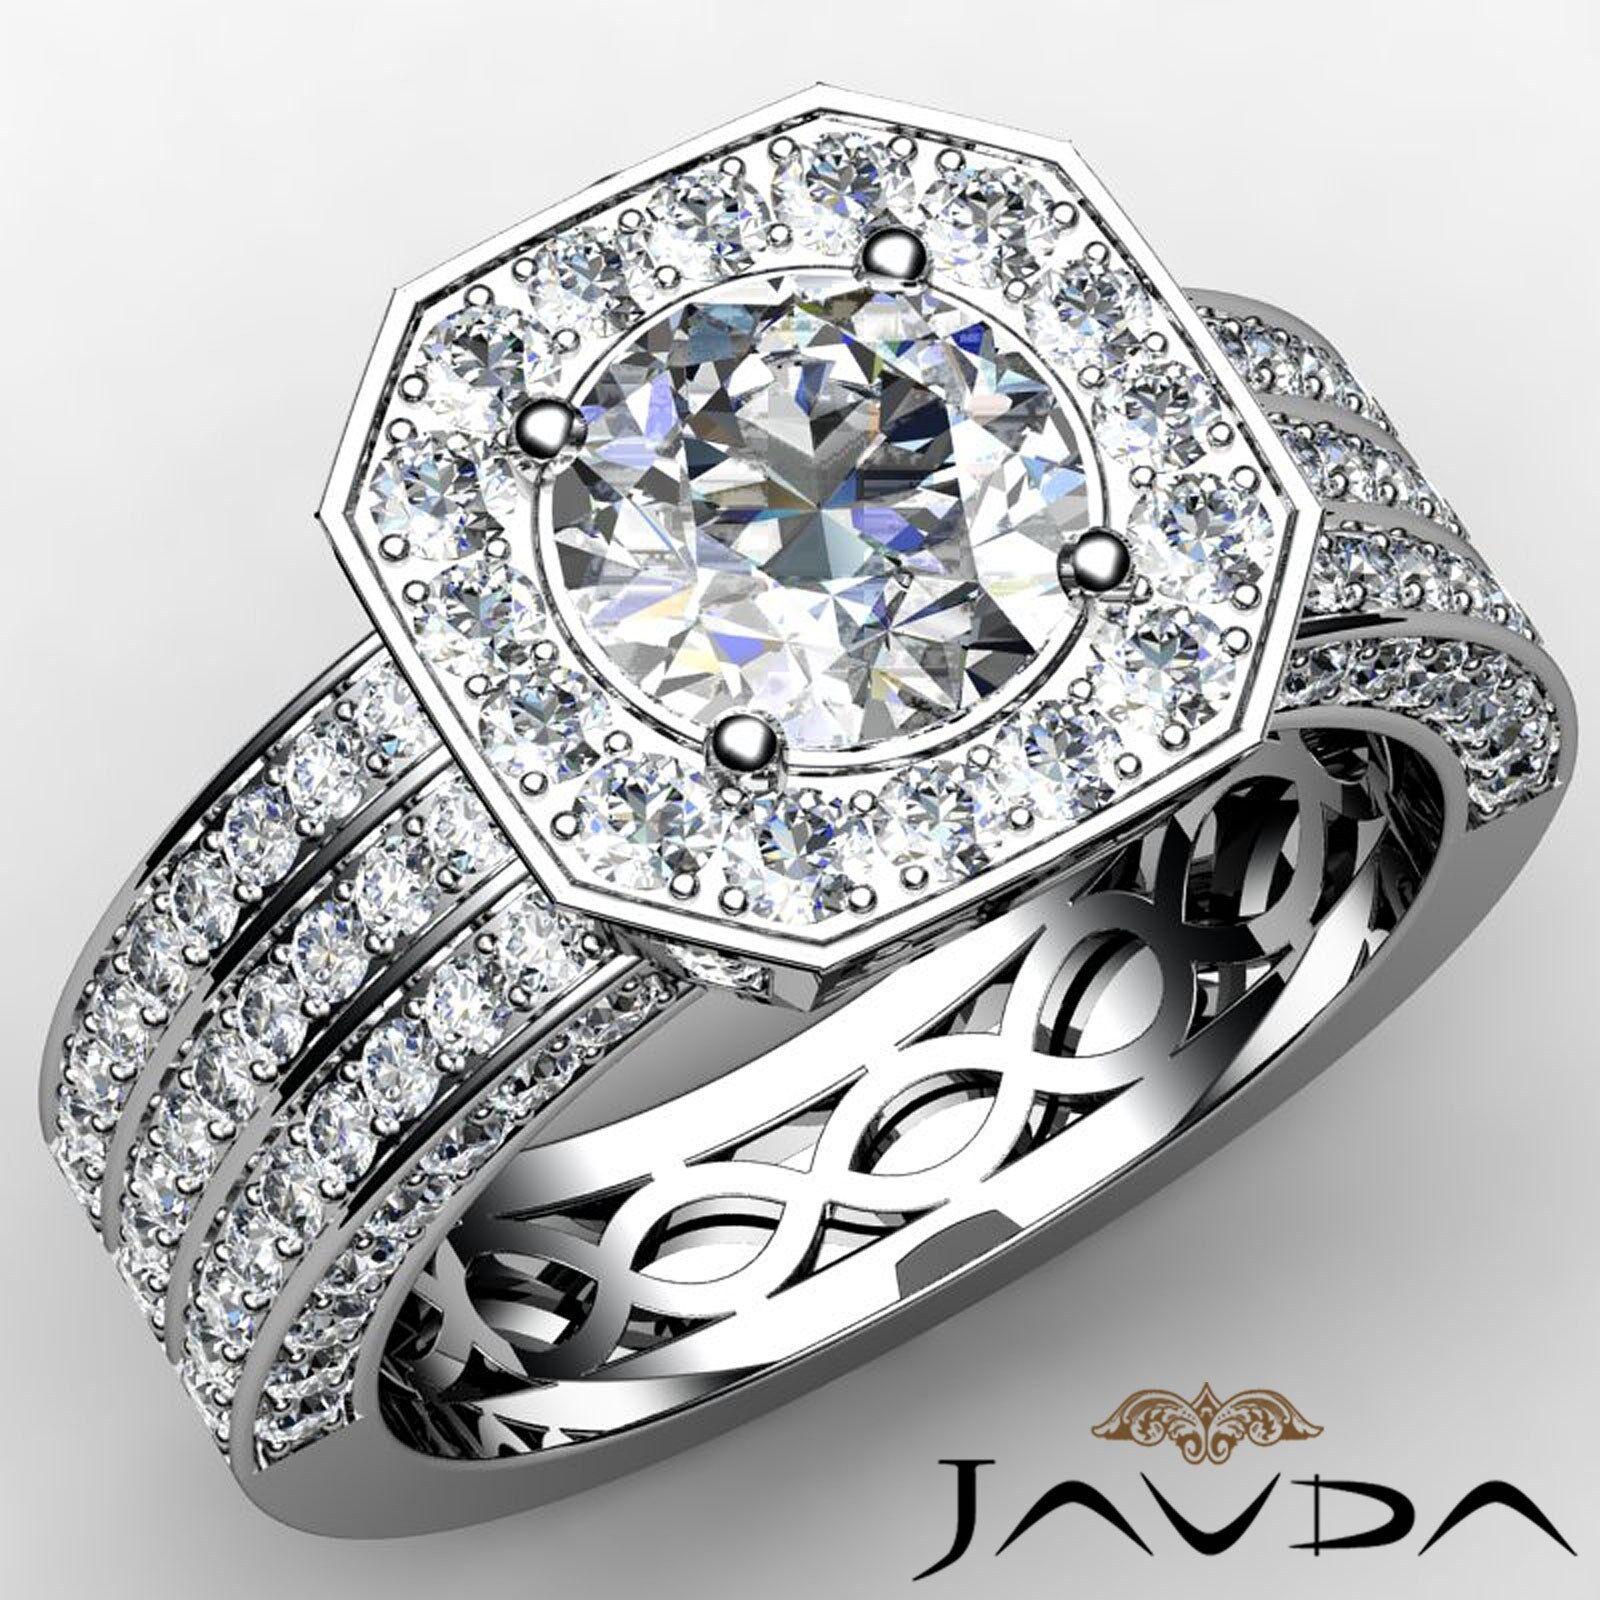 3Row Round Diamond Halo Pave Set Engagement Ring GIA F VS1 18k White Gold 2.97ct